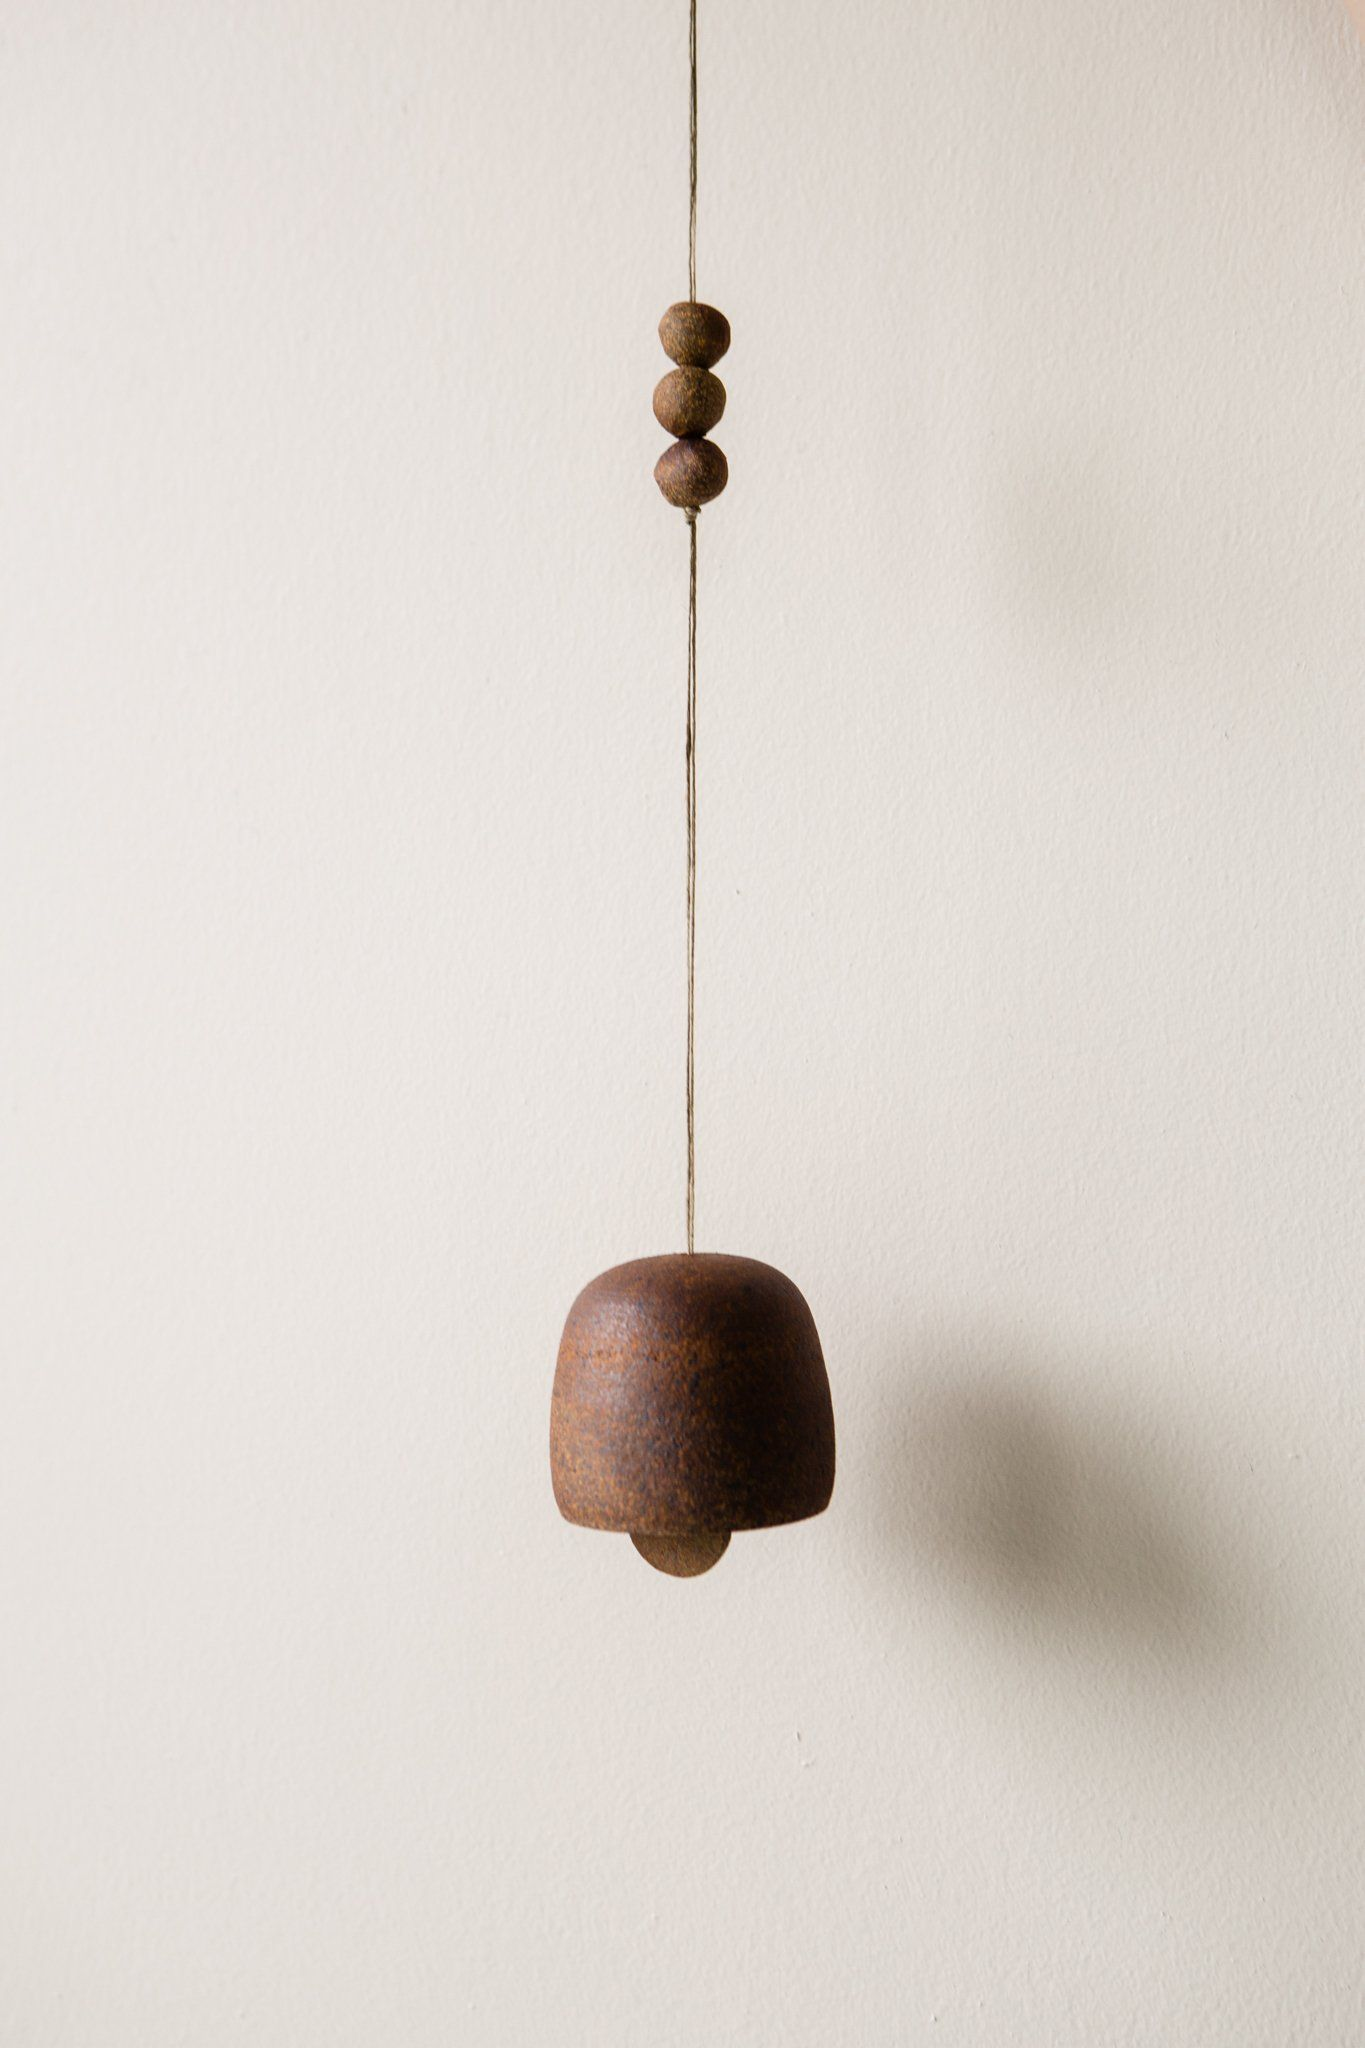 Hanging ceramic bell goodwin ceramic bell ceramics